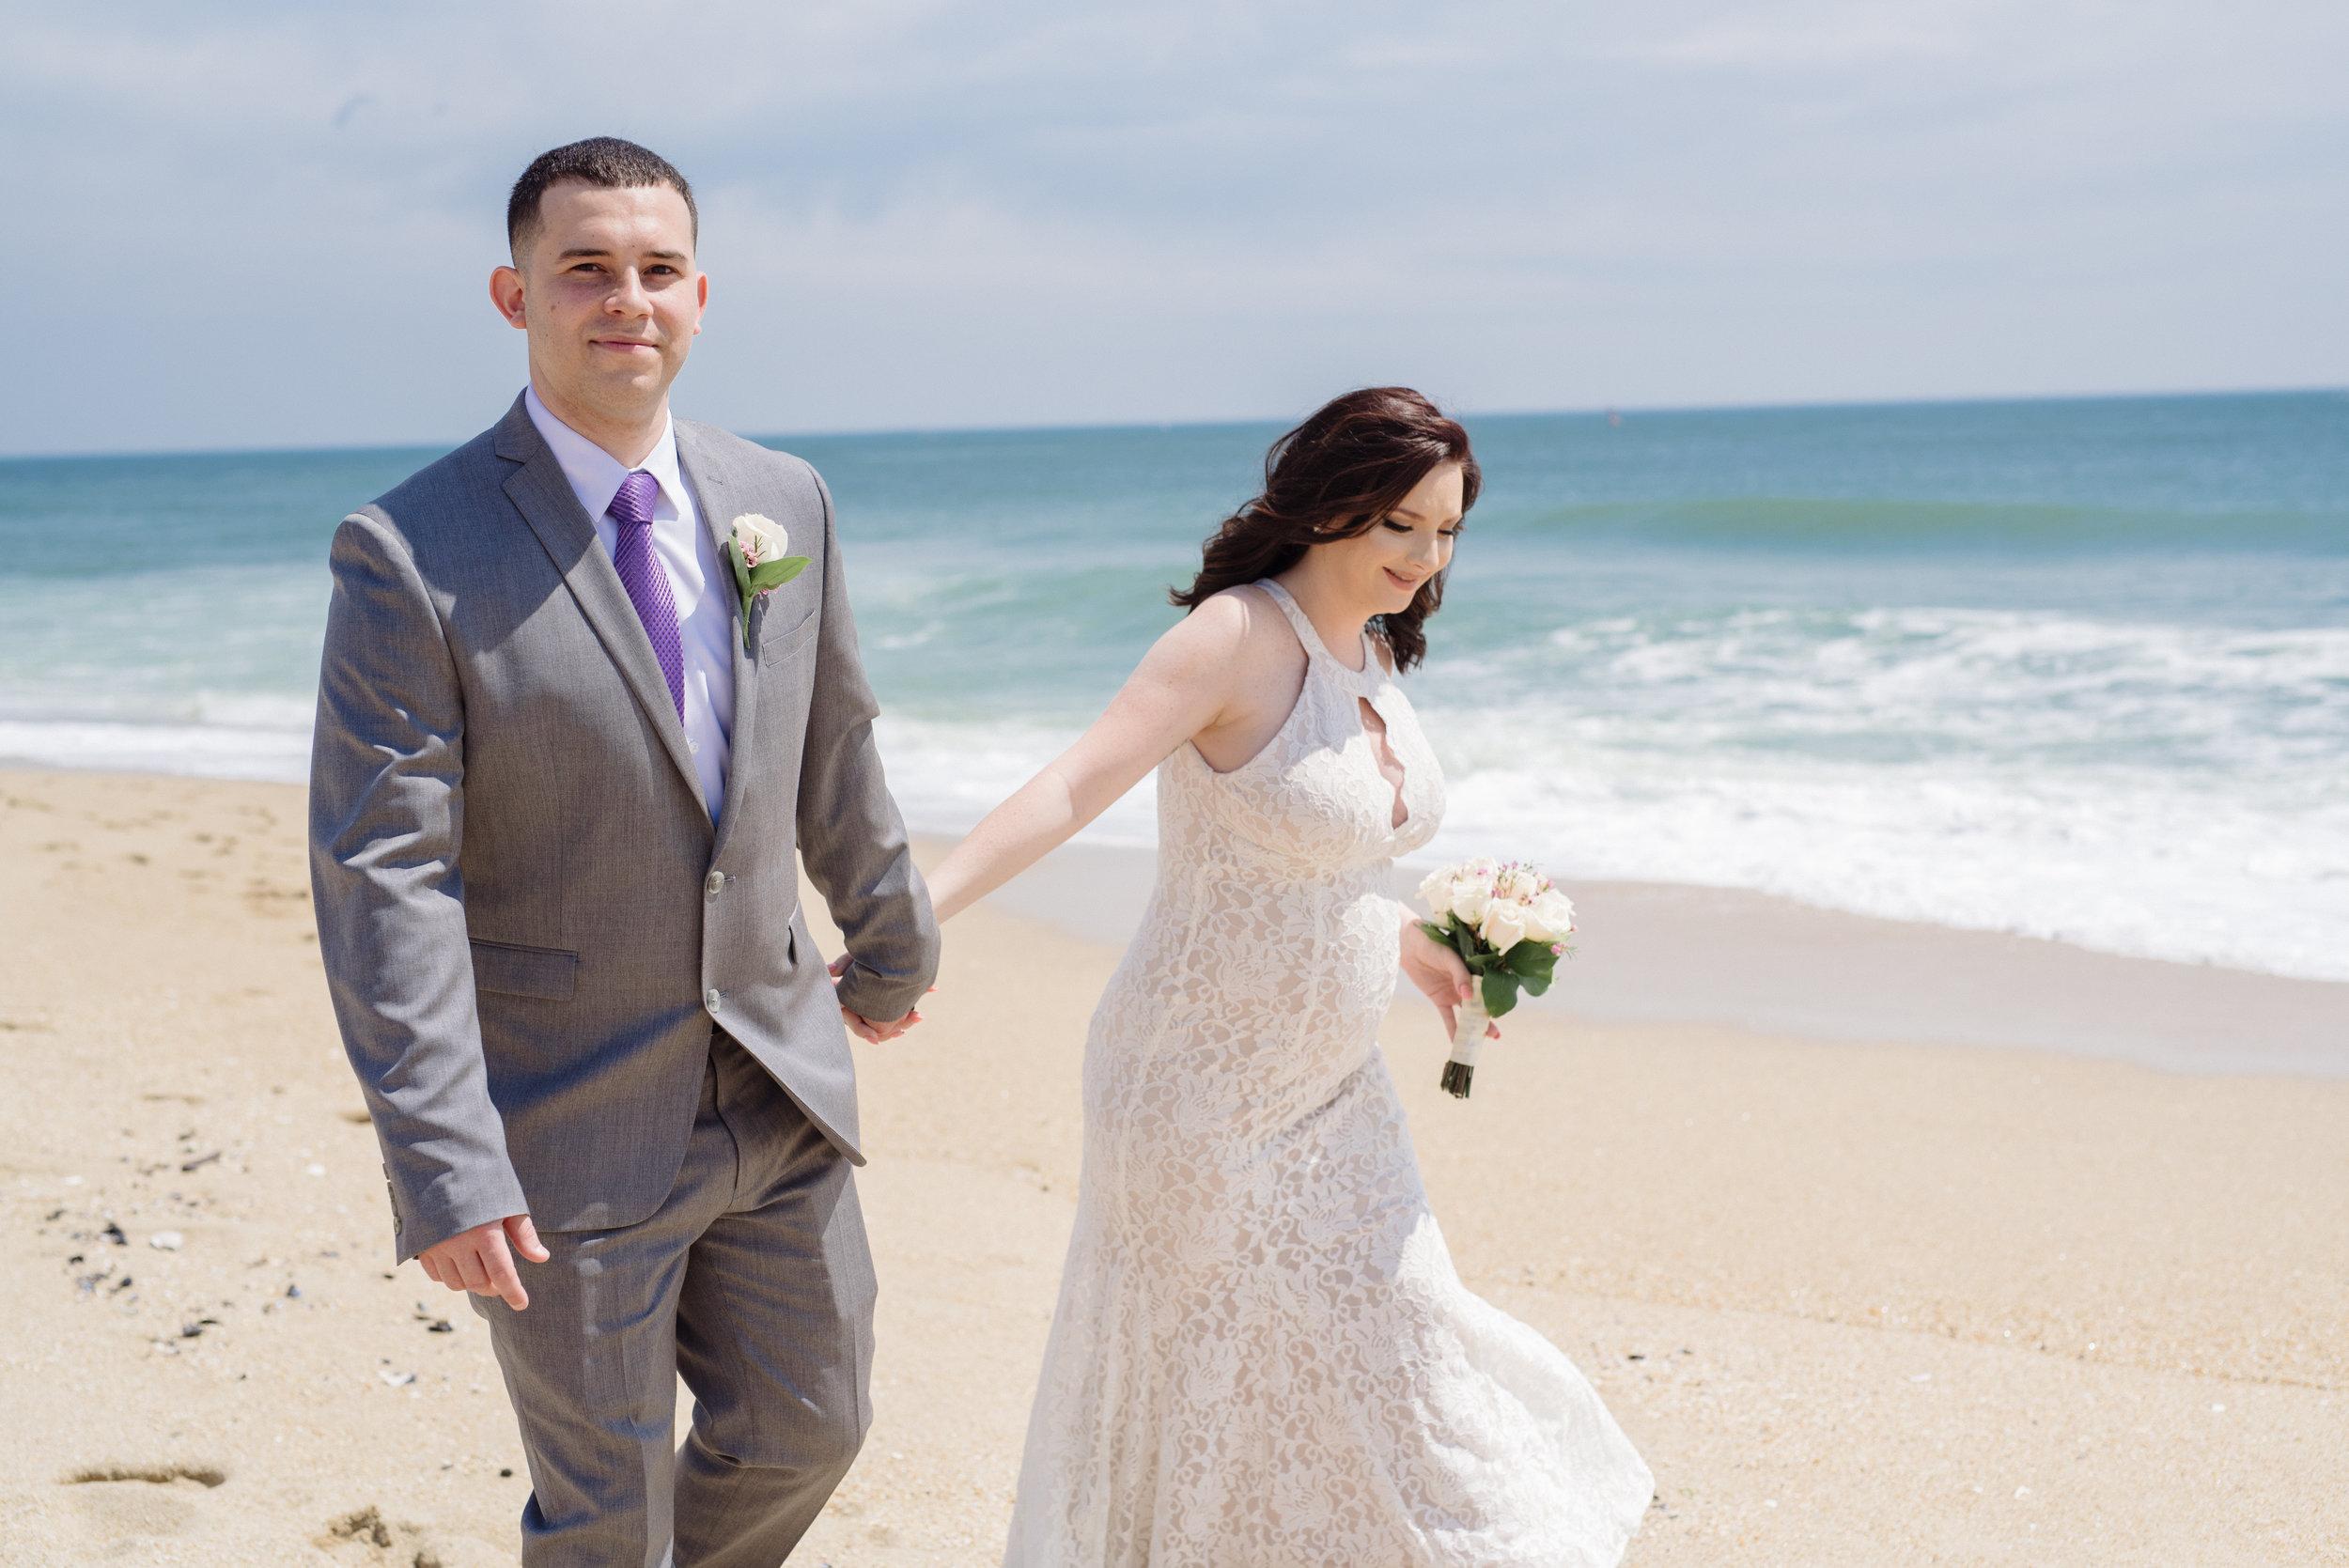 Caitlyn+Anthony- Belmar Beach Elopement- New Jersey Weddings- Olivia Christina Photo-83.JPG